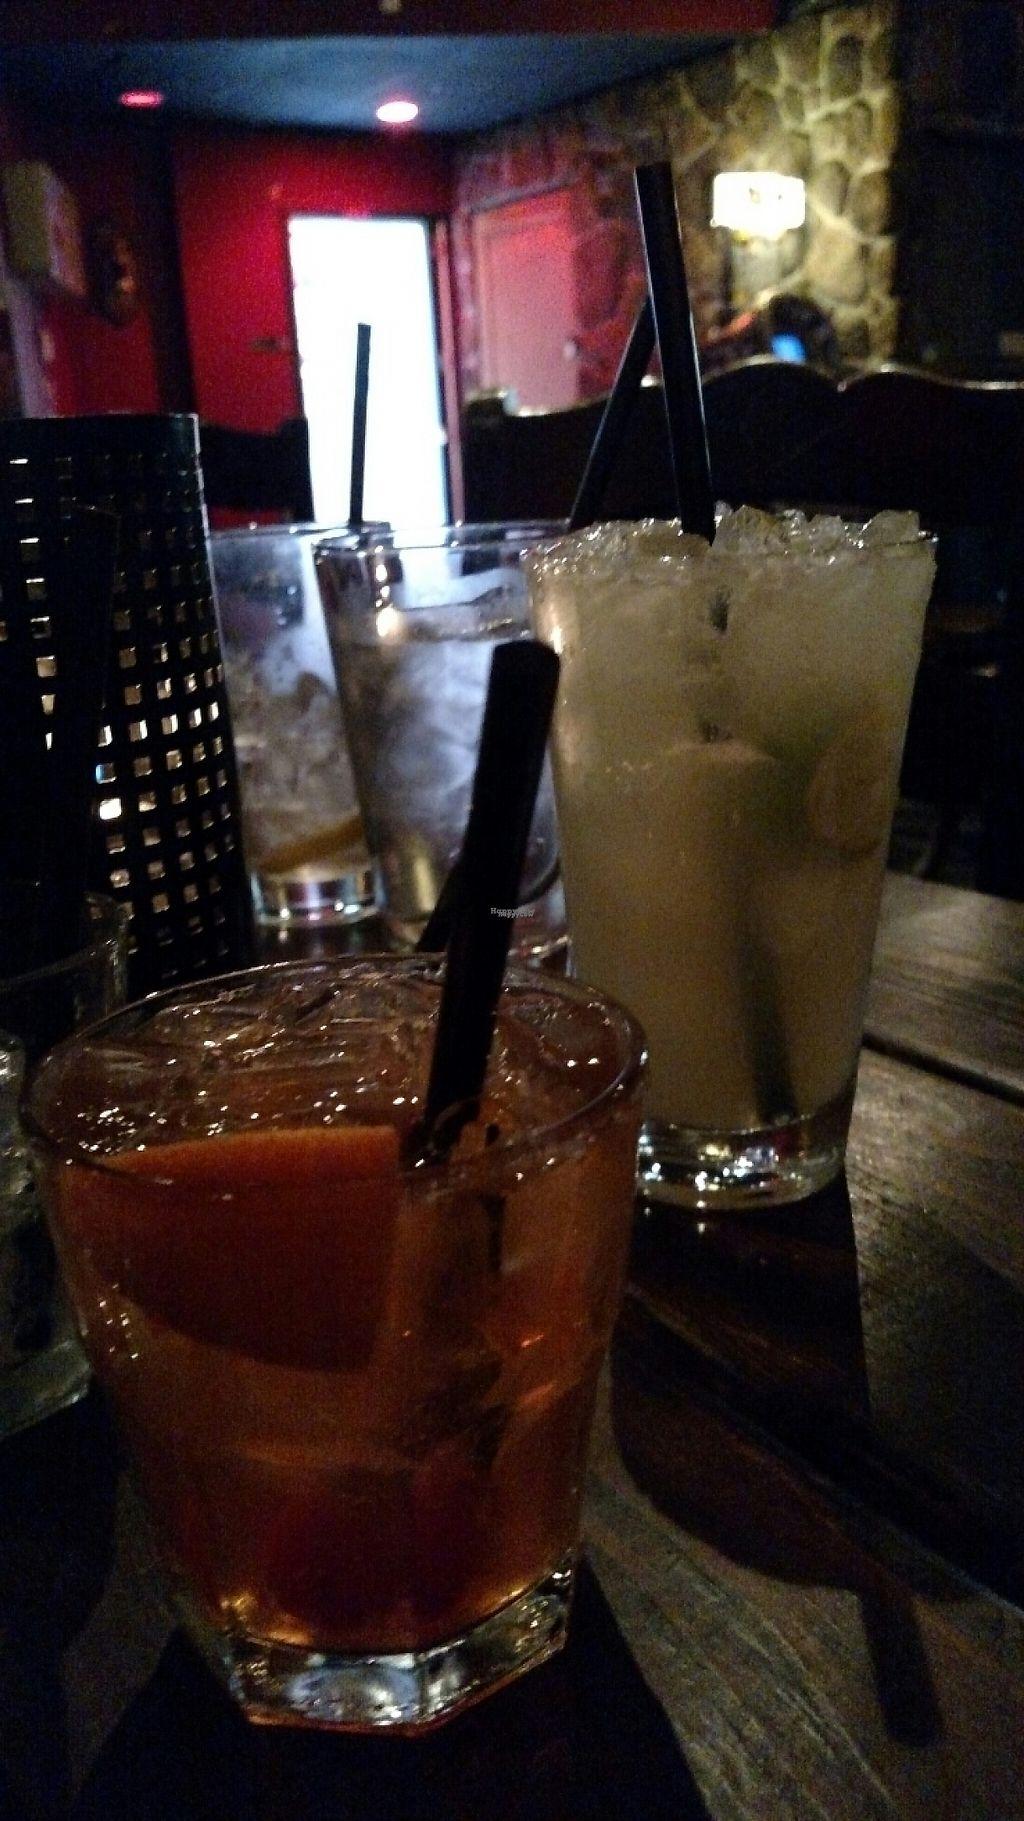 "Photo of Highline Bar  by <a href=""/members/profile/MrsBAJ"">MrsBAJ</a> <br/>Drinks <br/> April 12, 2017  - <a href='/contact/abuse/image/23034/247384'>Report</a>"